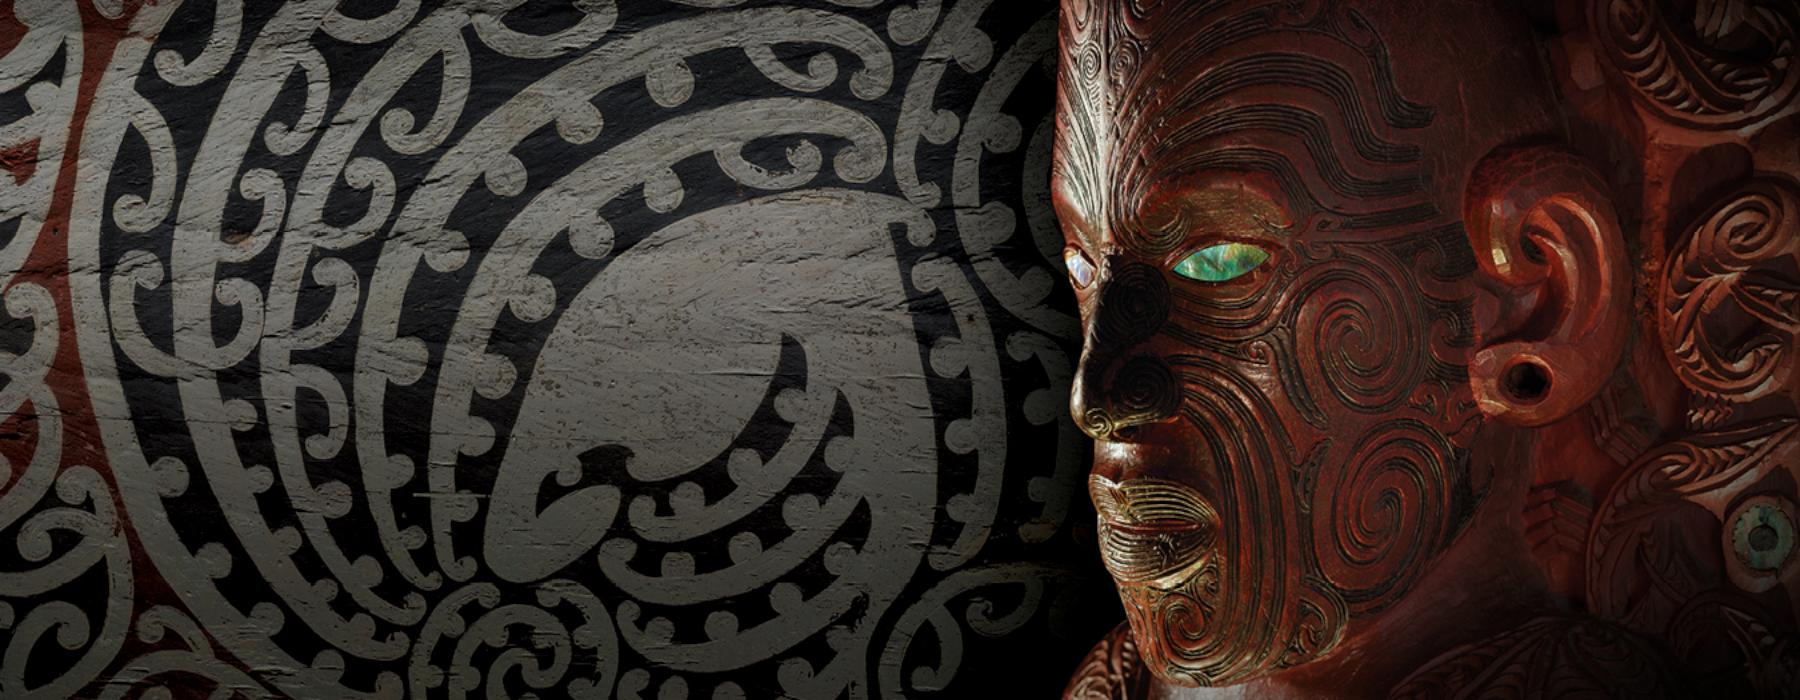 Māori designs and carving